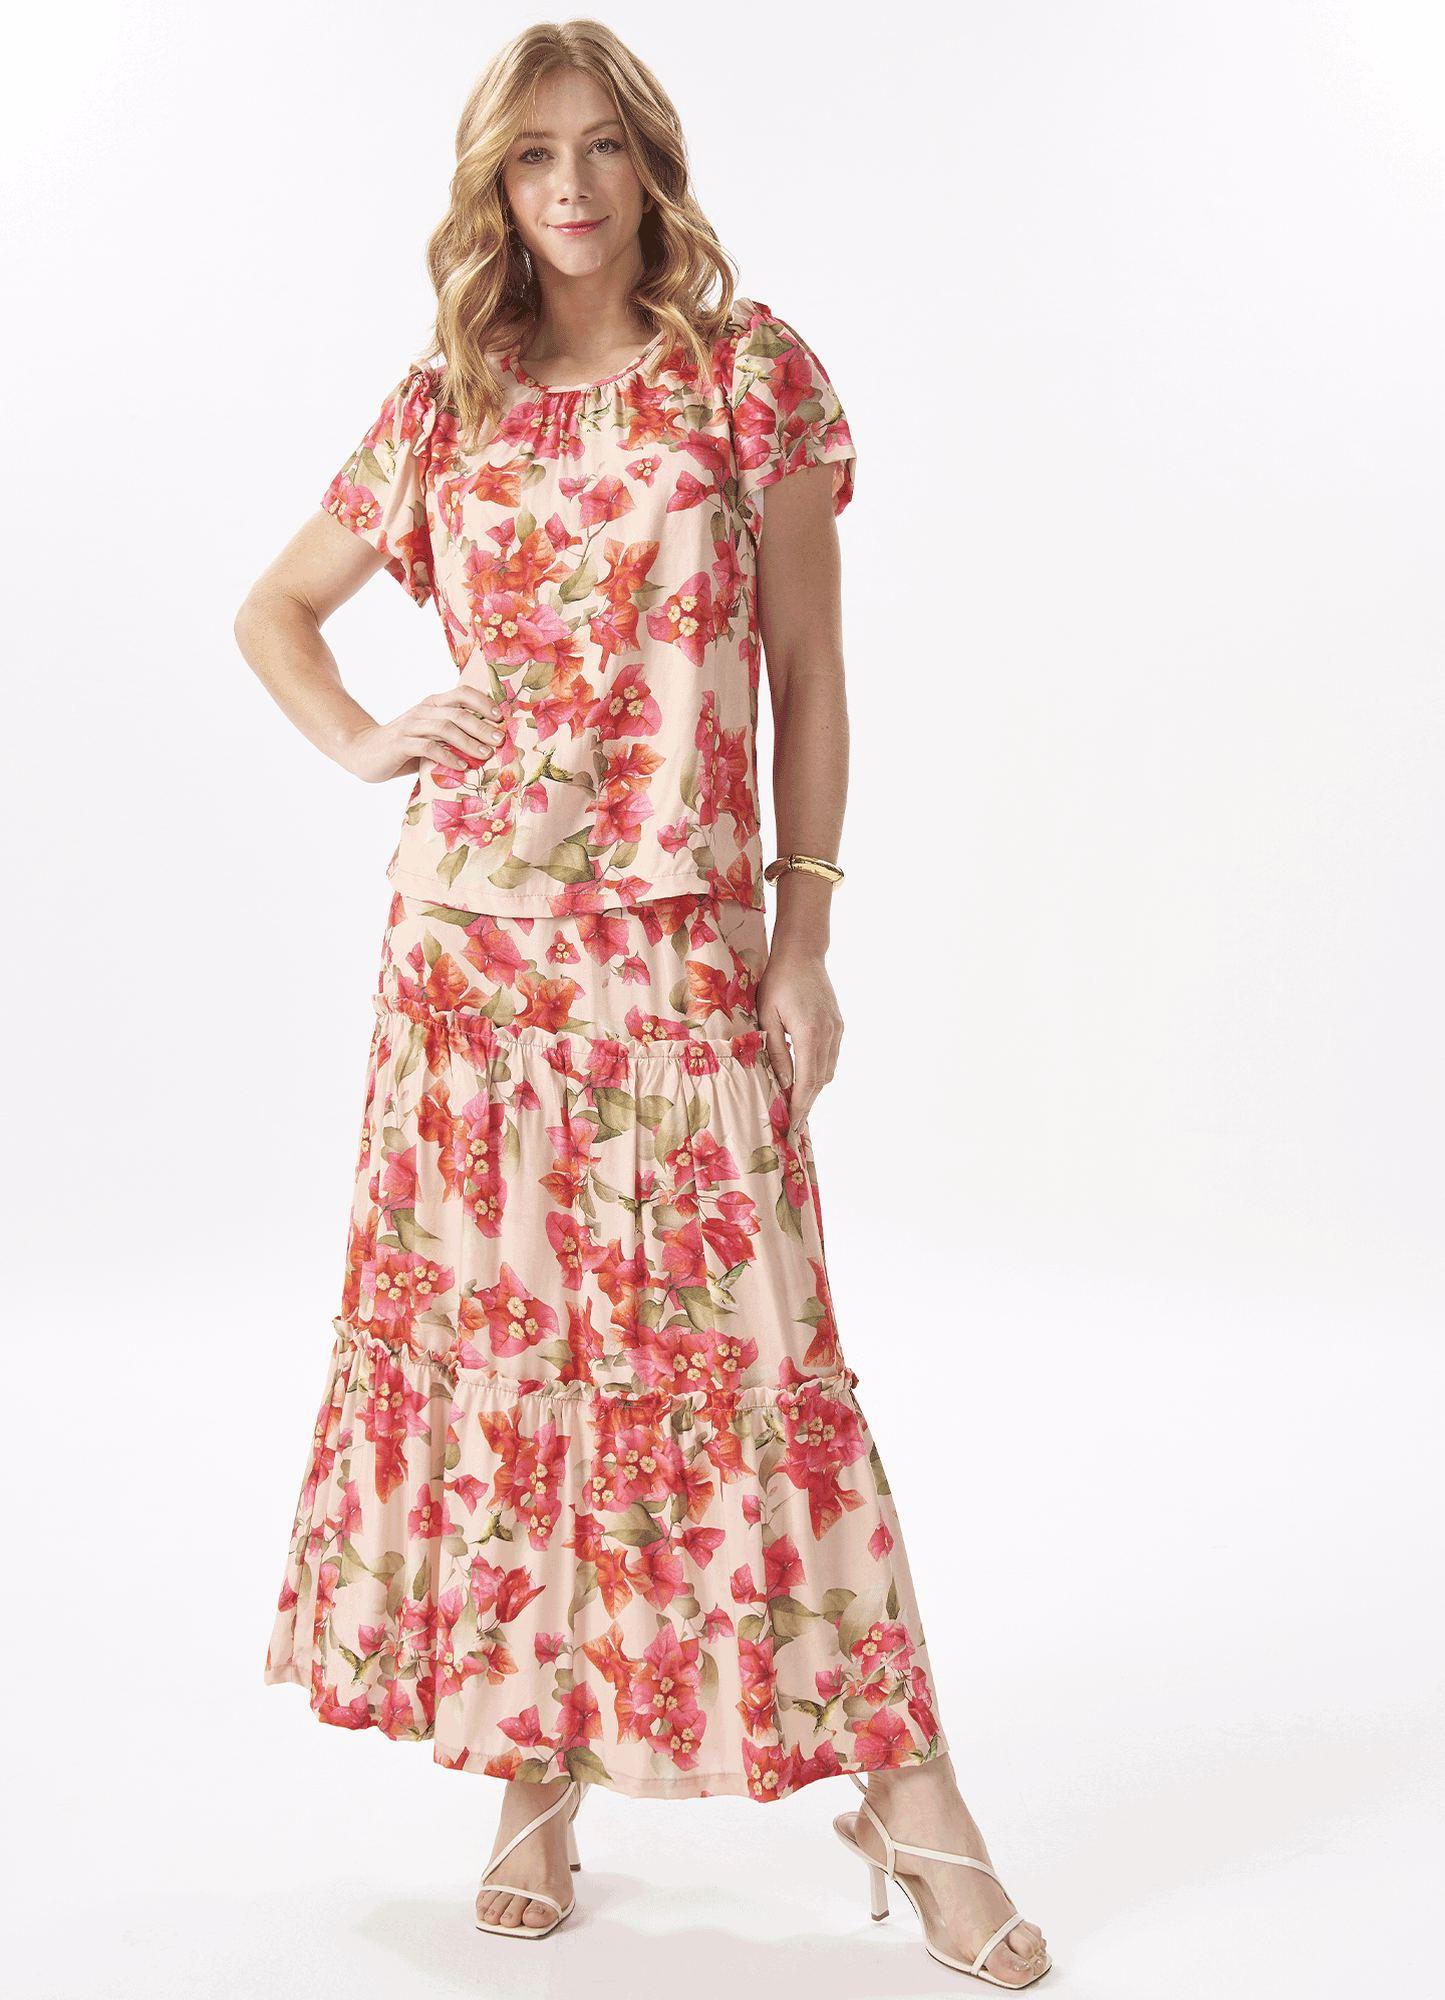 Saia Feminina Longa Tecido Estampa Floral 3 Marias